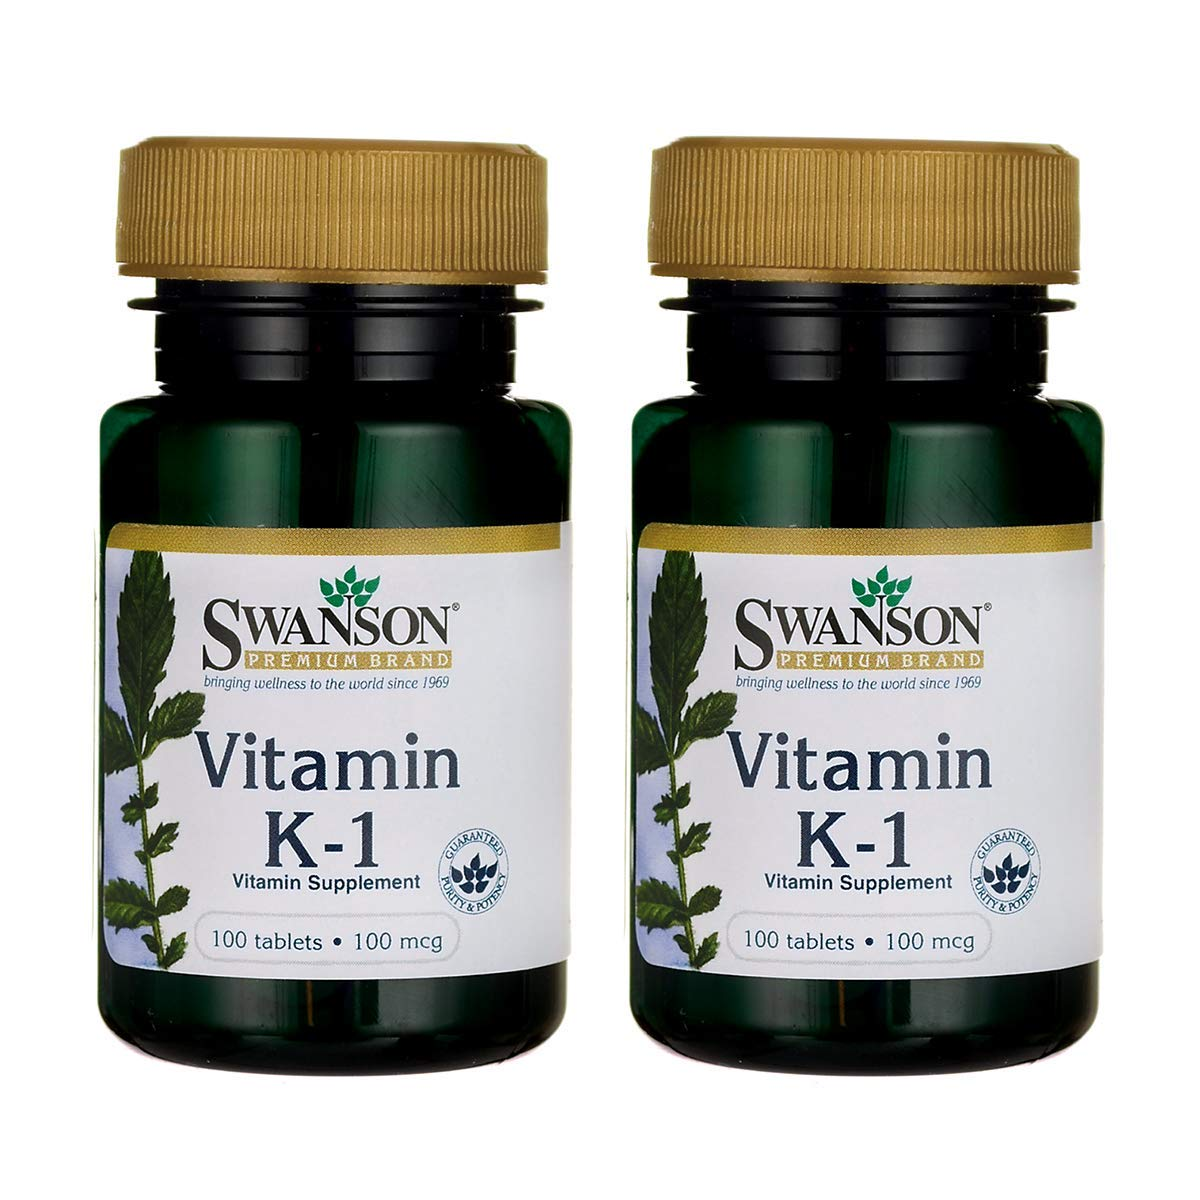 Swanson Vitamin K-1 100 mcg 100 Tabs (2 Pack)